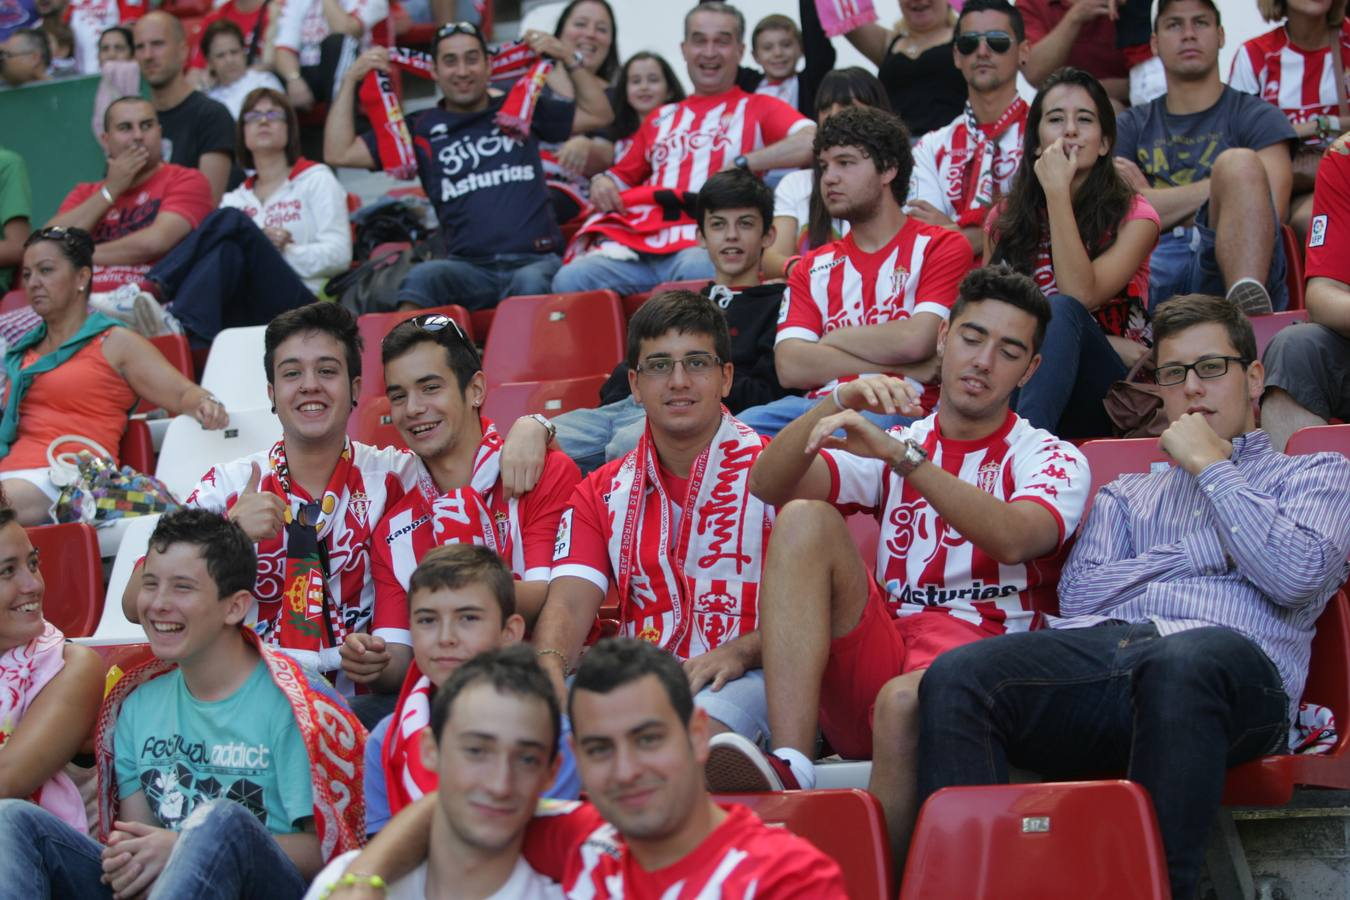 ¿Estuviste en el Sporting-Mallorca? ¡Búscate!